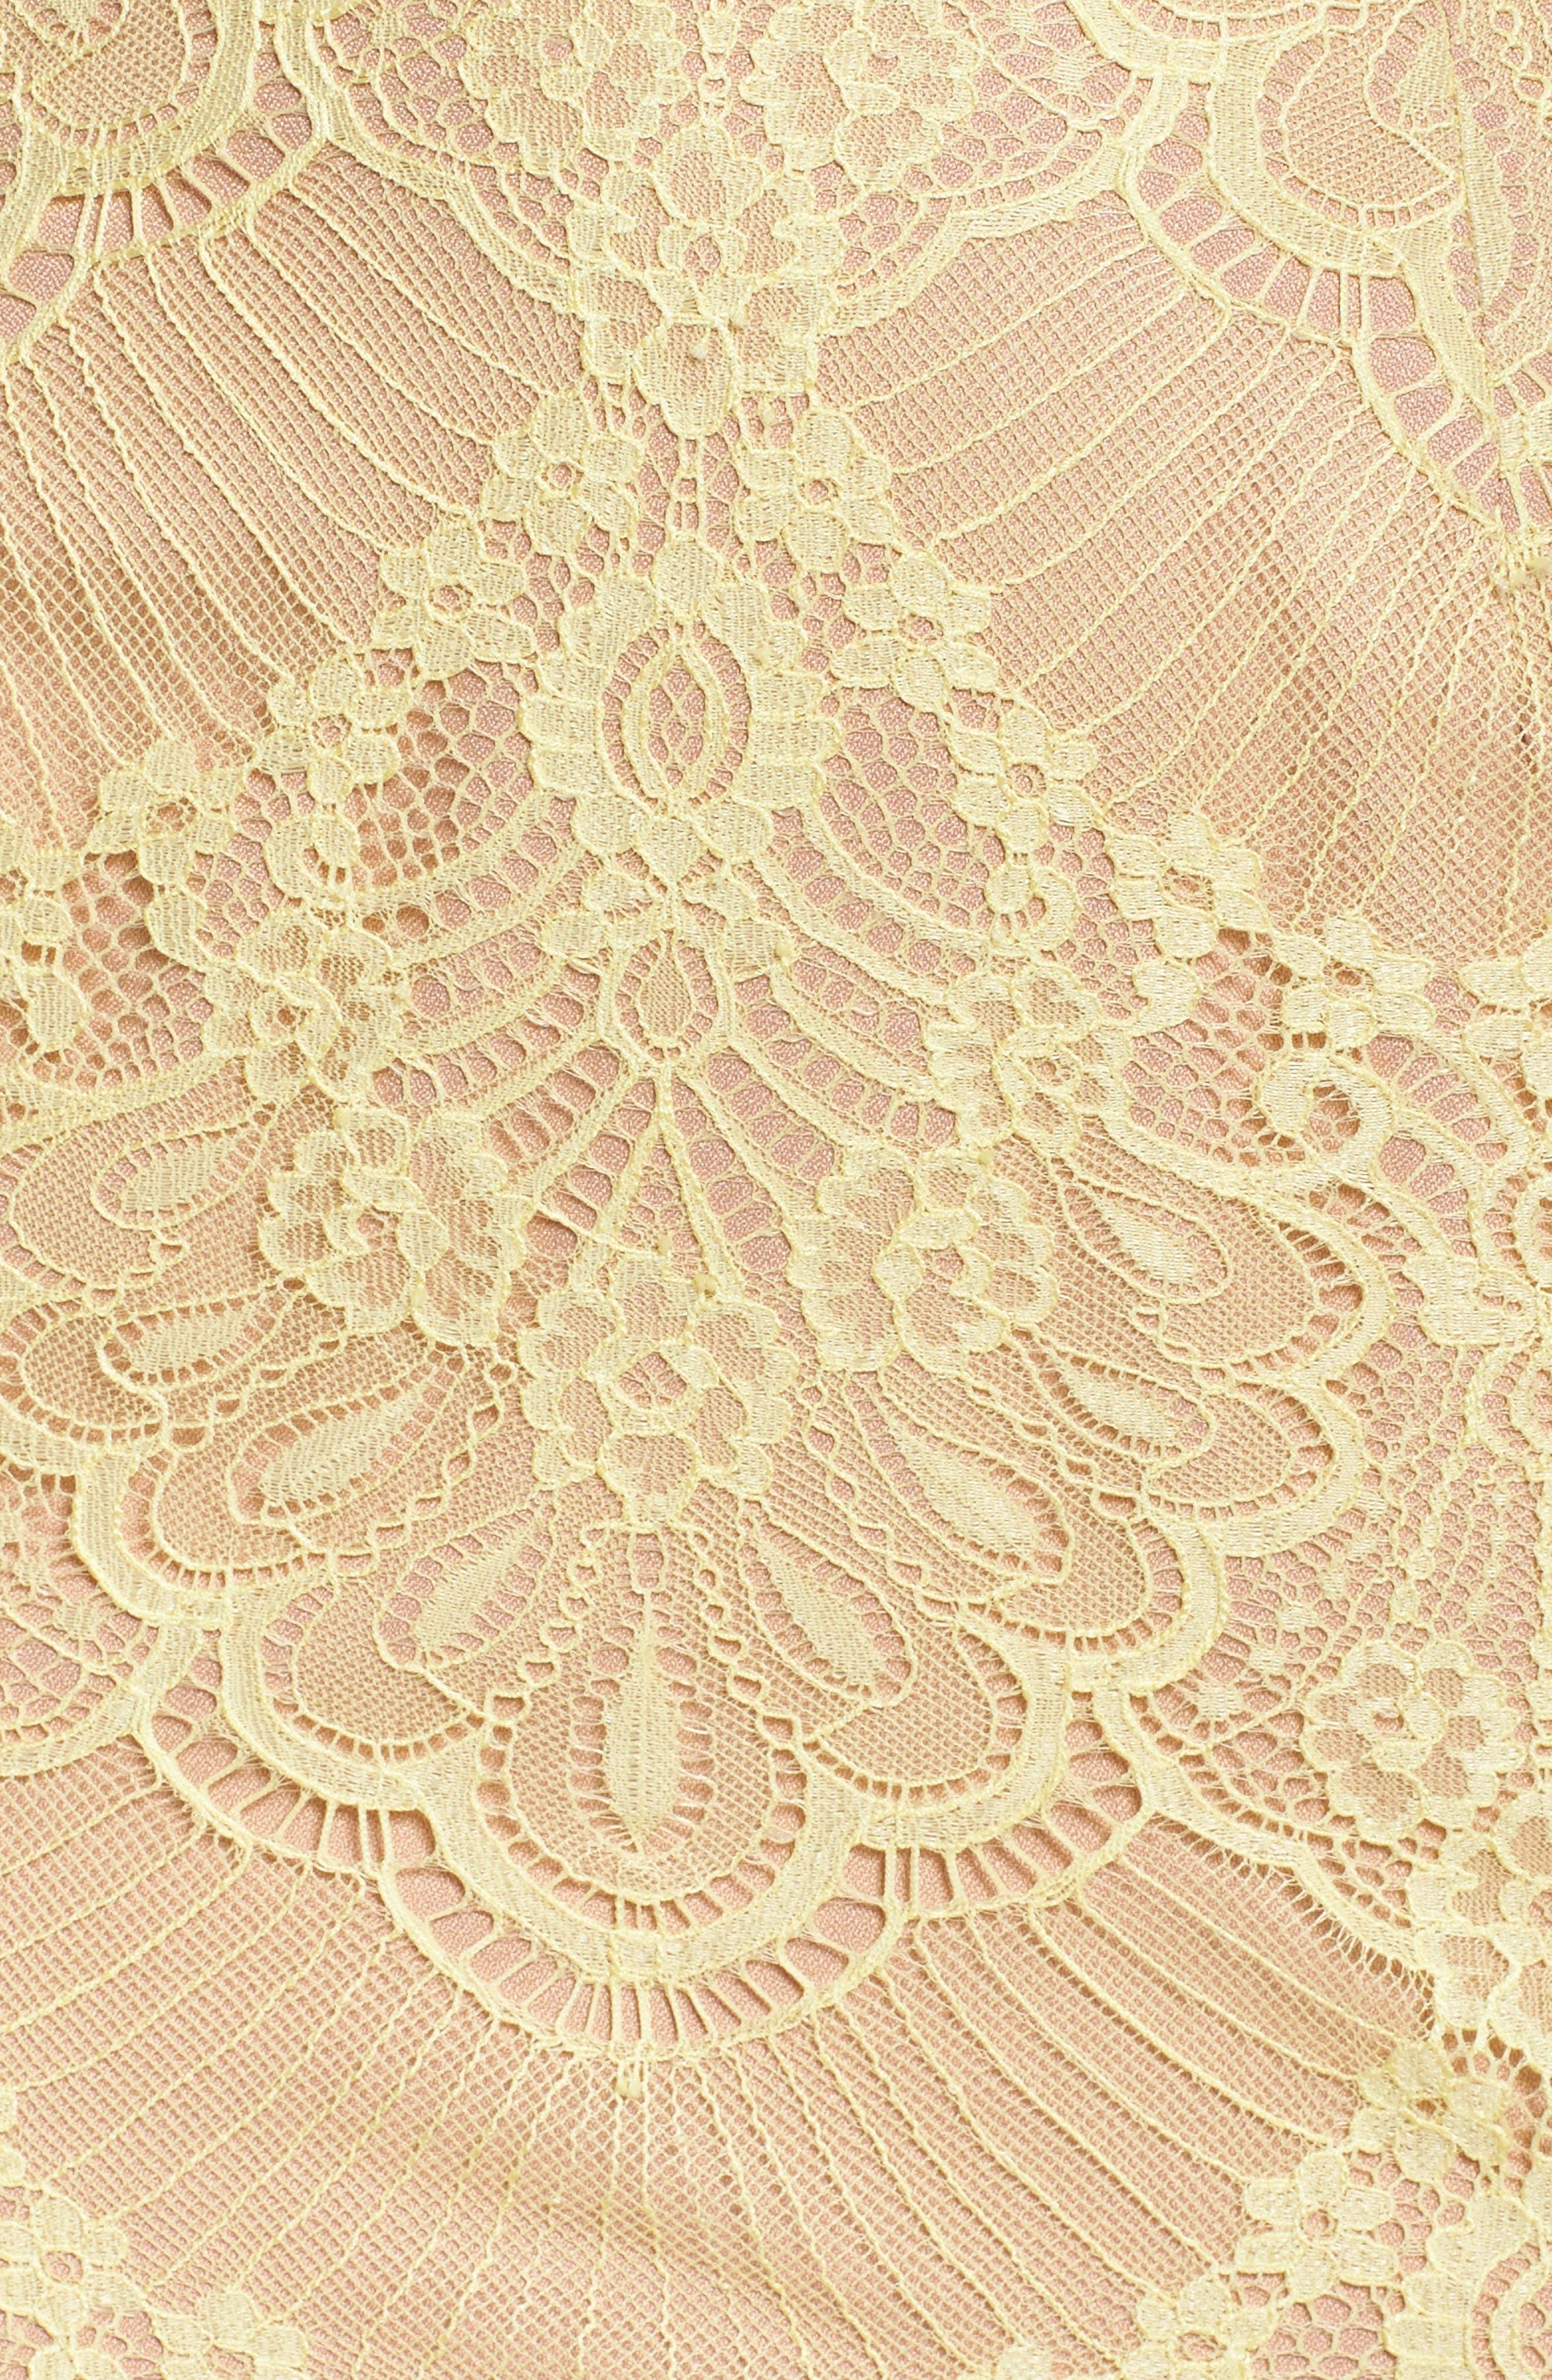 Toril Off the Shoulder Lace Midi Dress,                             Alternate thumbnail 5, color,                             742